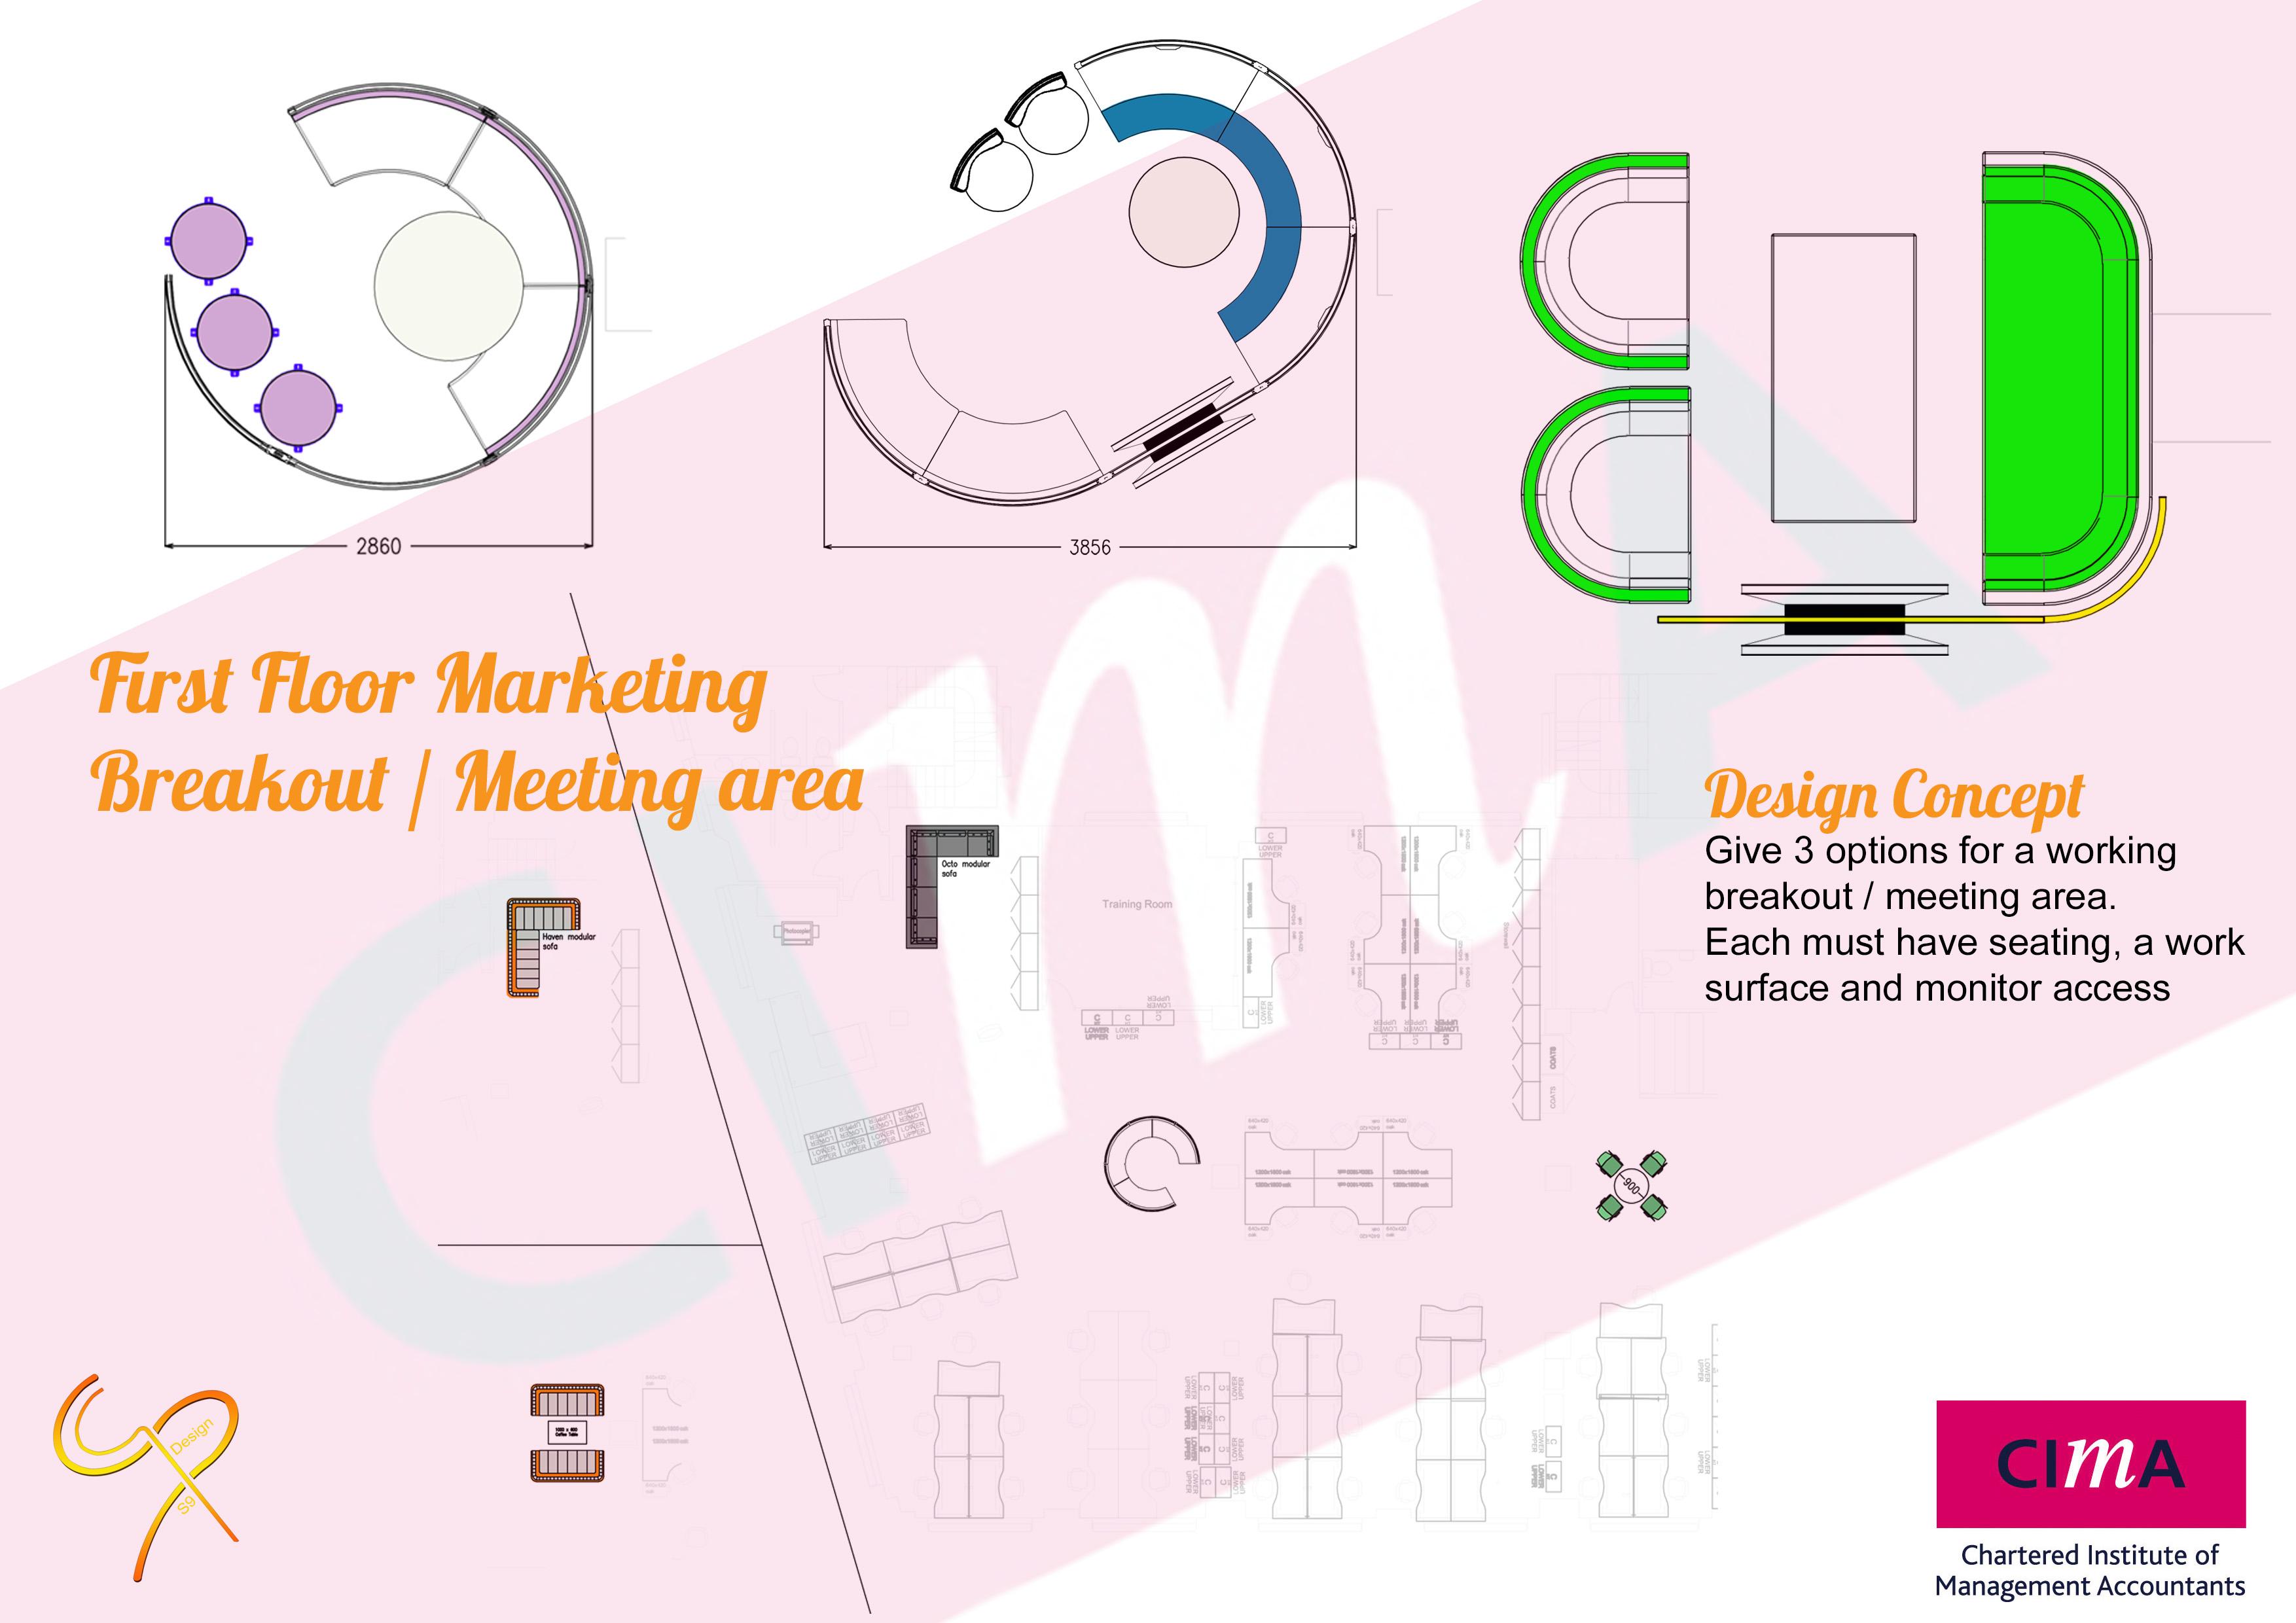 CIMA - First Floor Marketing Options